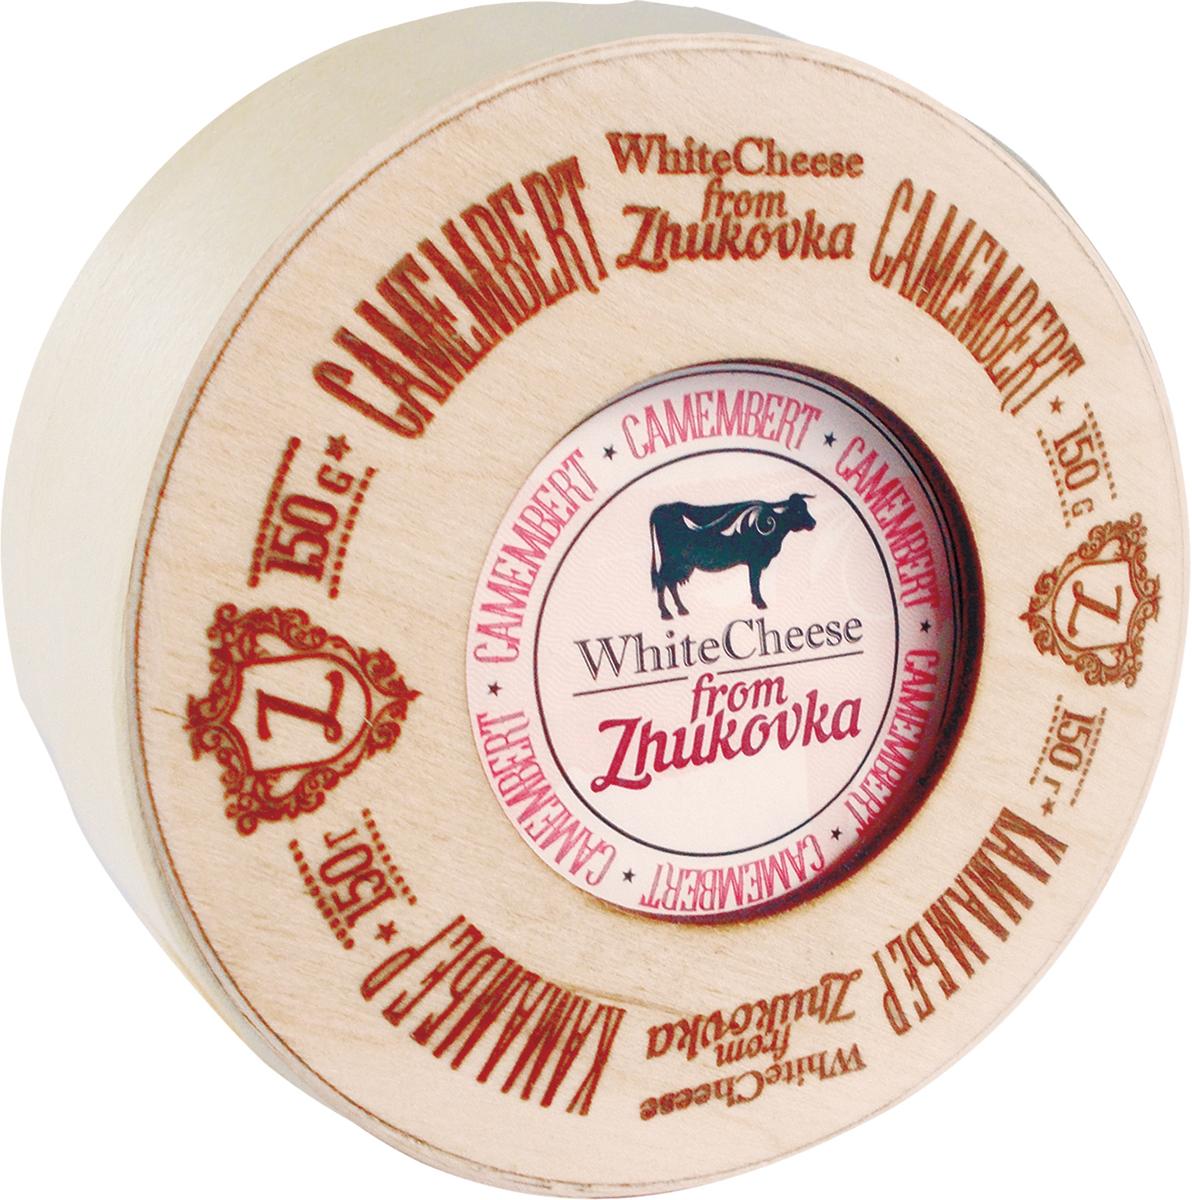 WhiteCheese from Zhukovka Сыр Камамбер с белой плесенью 50%, 150 г (деревянная упаковка)